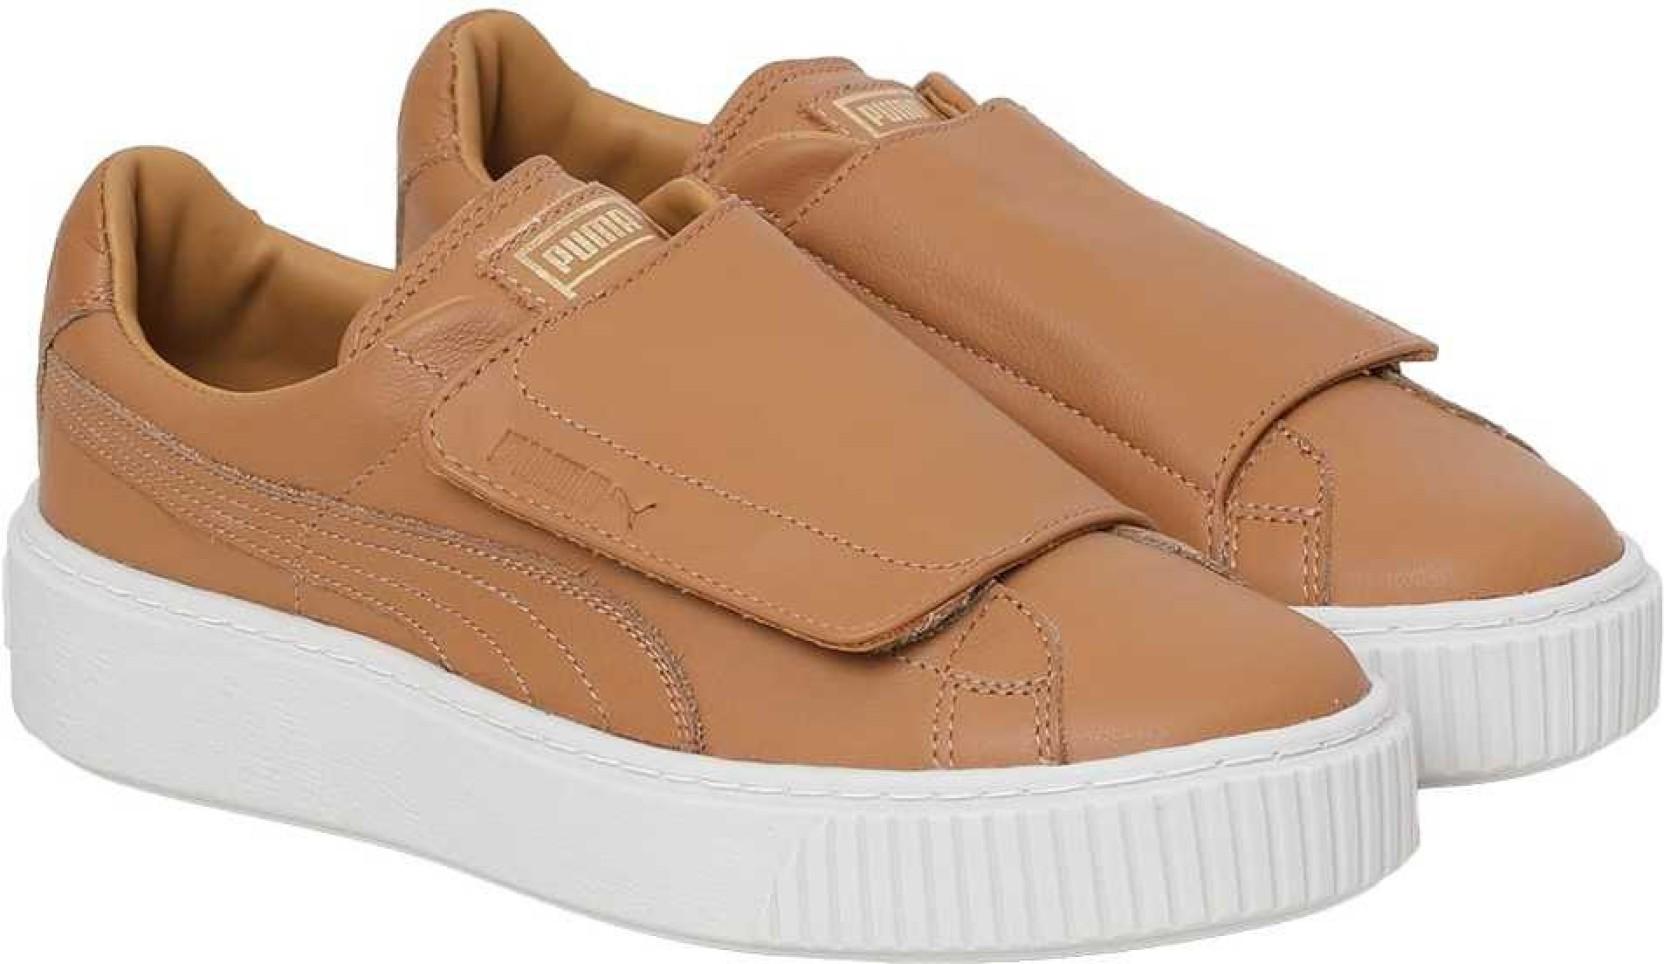 8e6ea8137bf Puma Basket Platform Strap Wn s Sneakers For Women - Buy Puma Basket ...